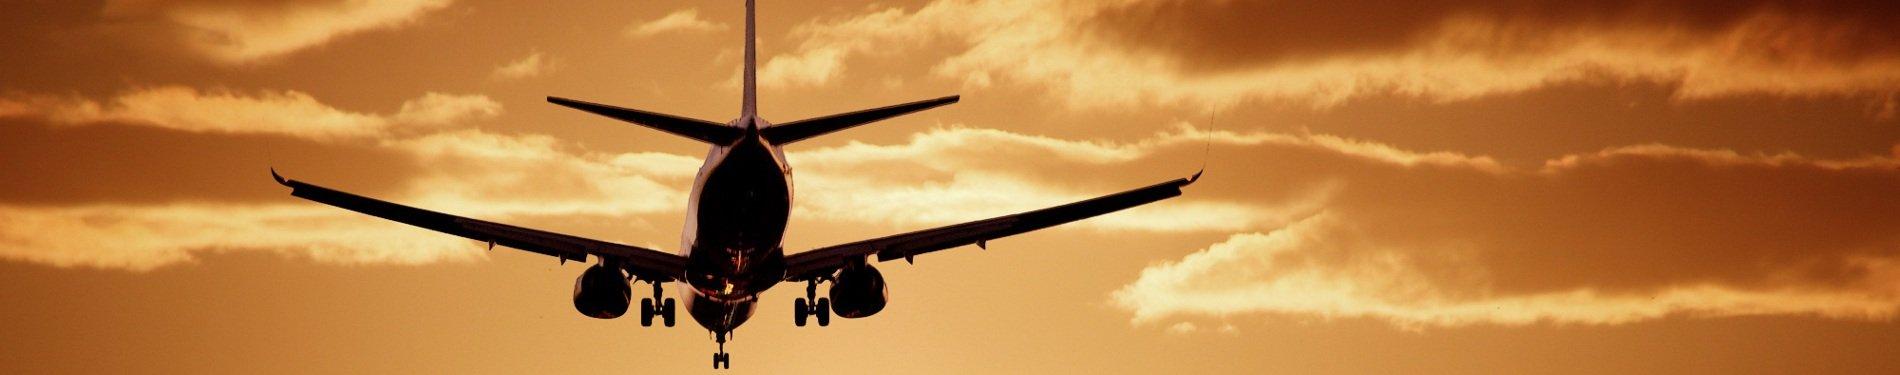 pixabay-aereo-come-arrivare